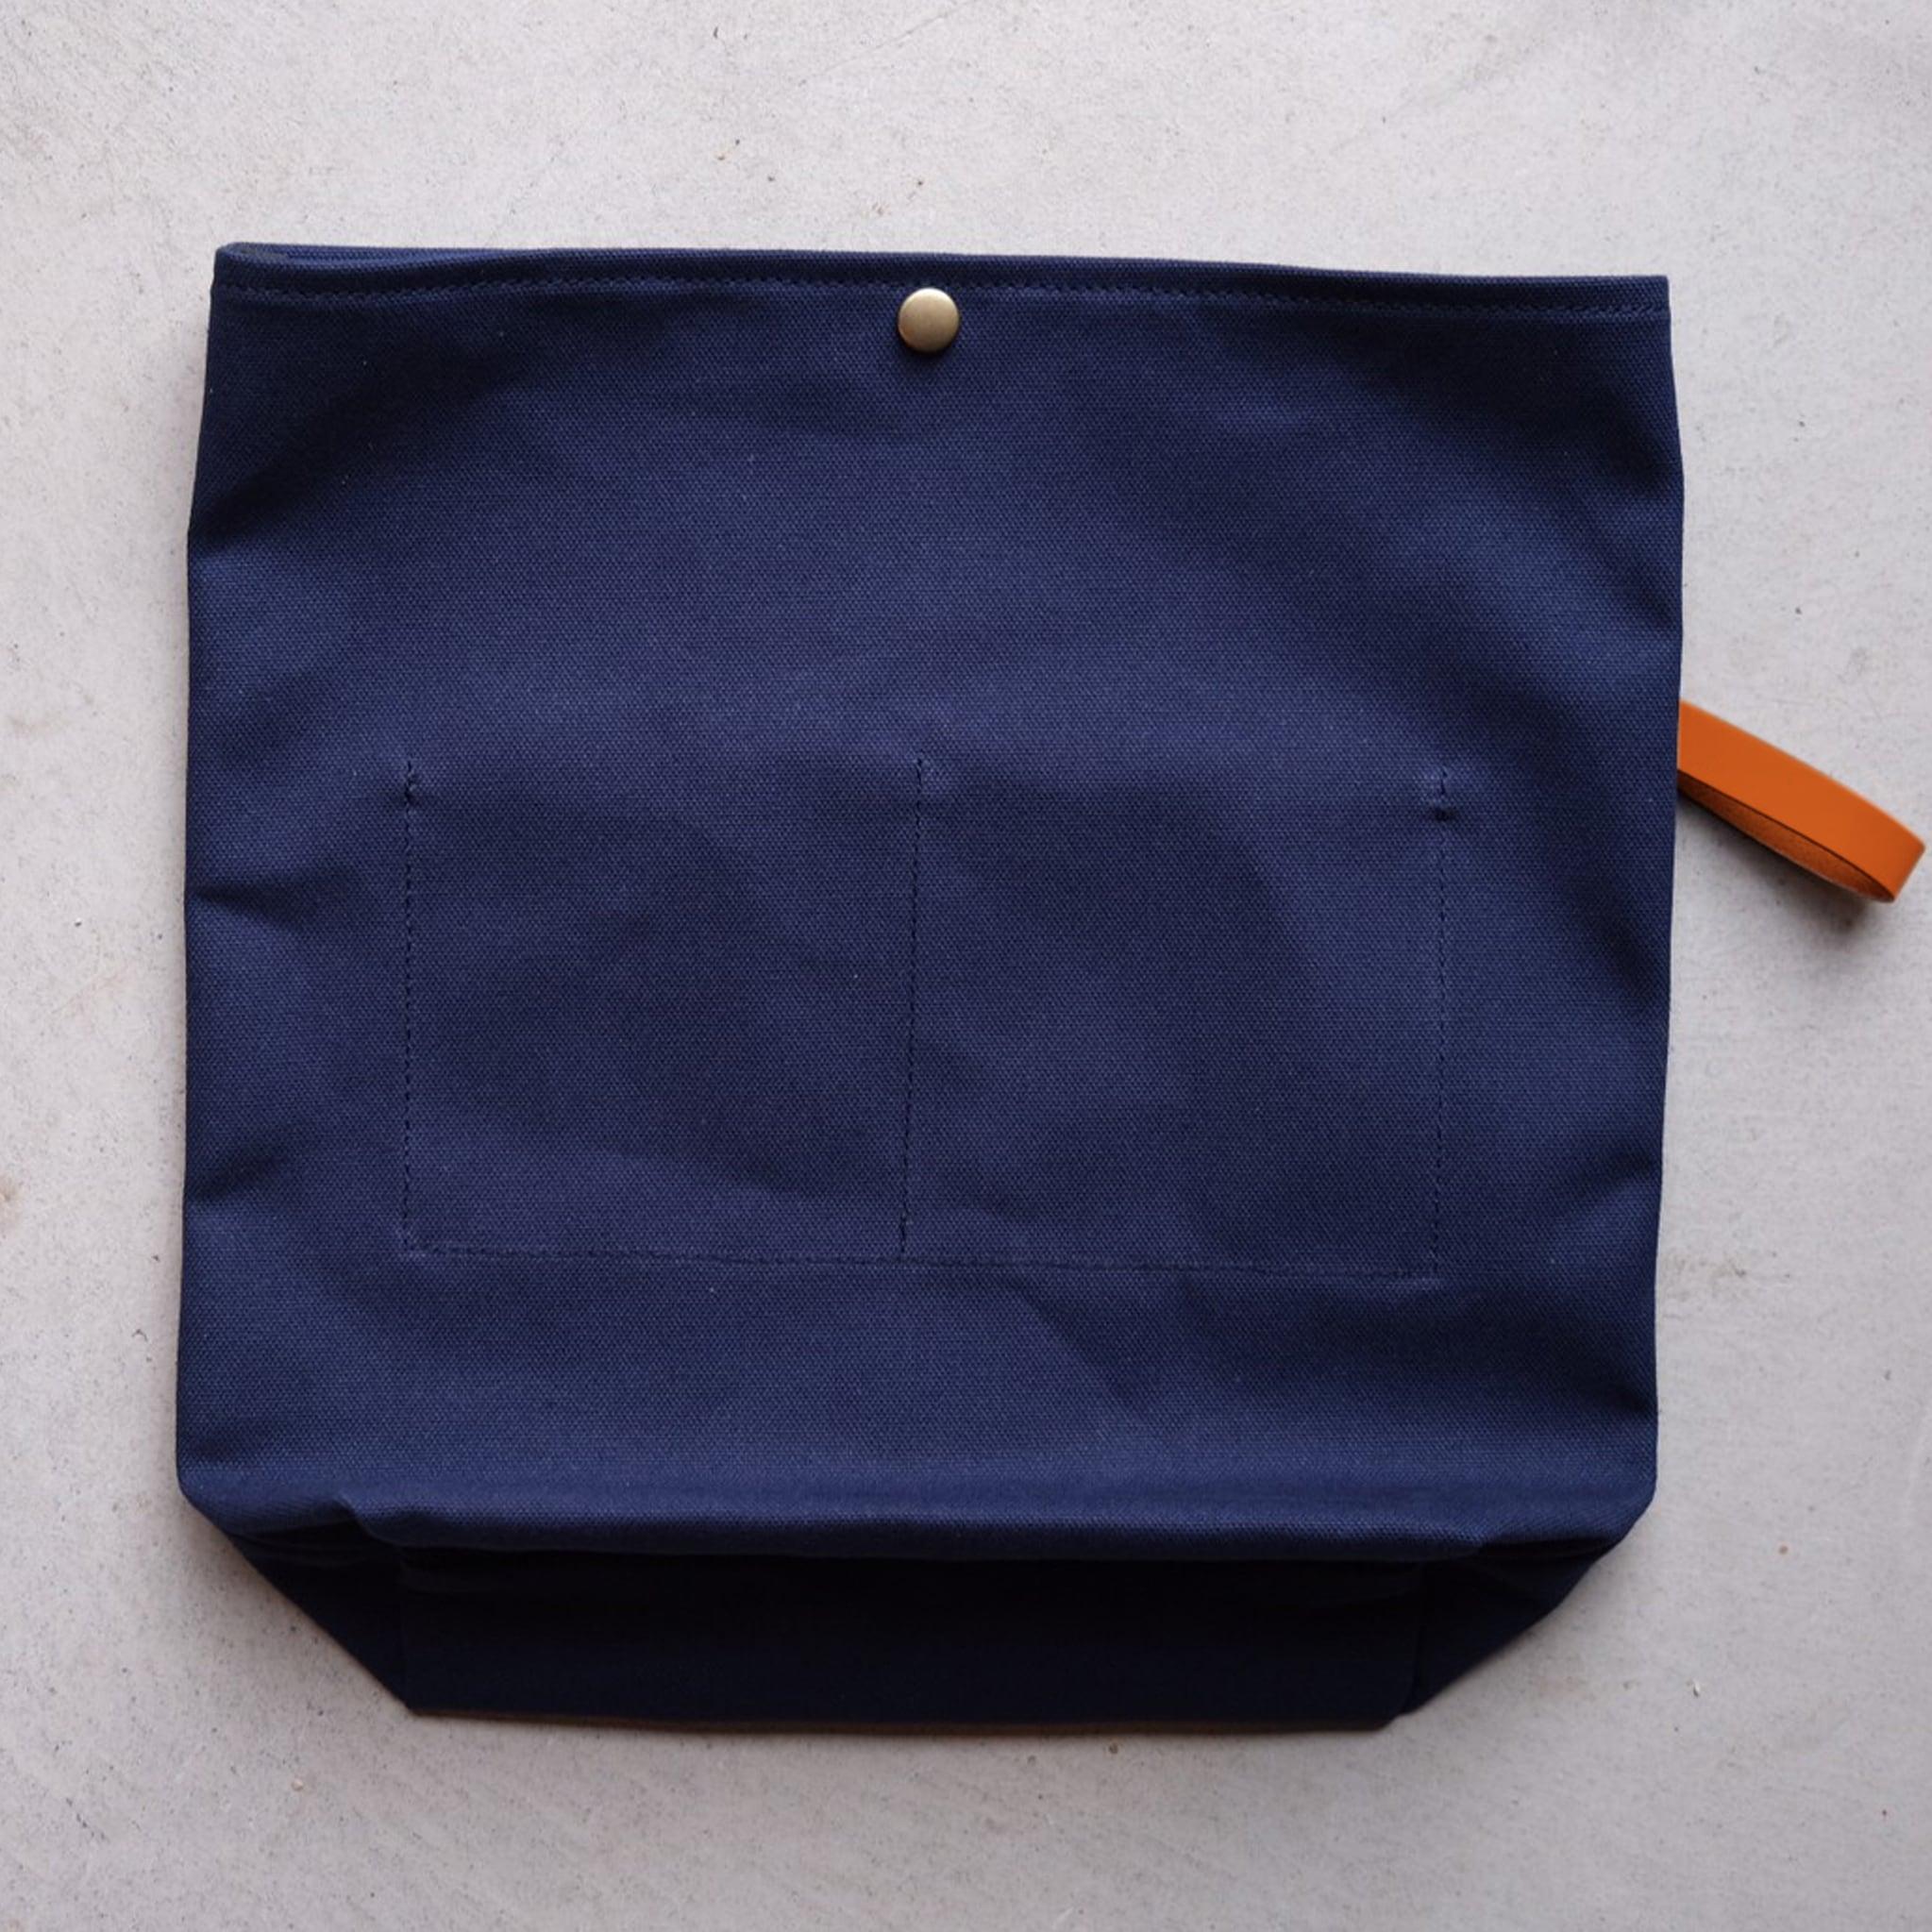 QUATTRO VINI用インナーバッグ 〈 Navy 〉